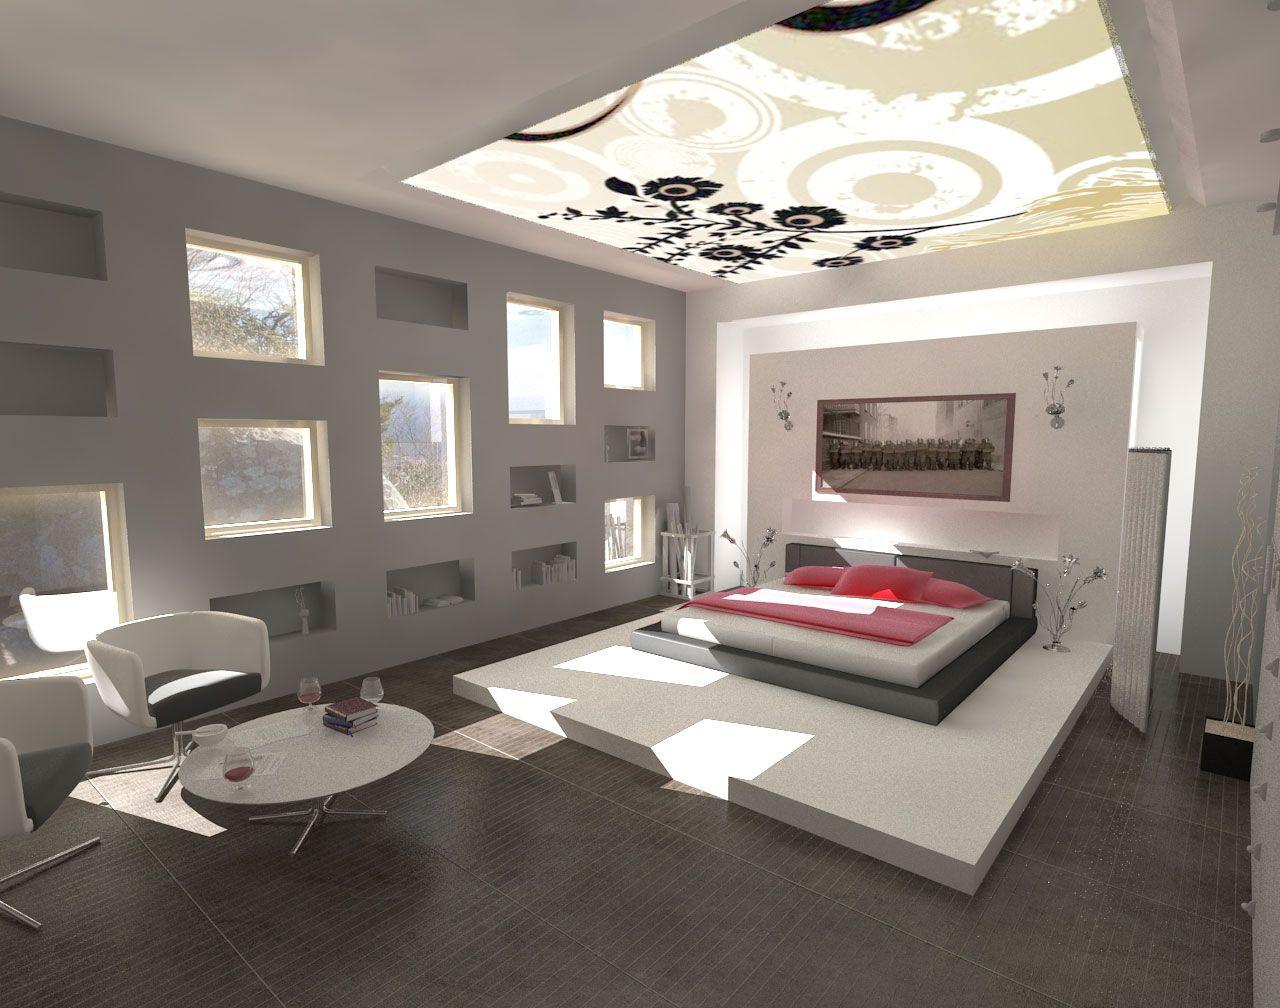 modern bedroom ceiling design ideas 2015. Brilliant 2015 Minimalist Modern Bedroom Interior Design Ideas With Ceiling 2015 E